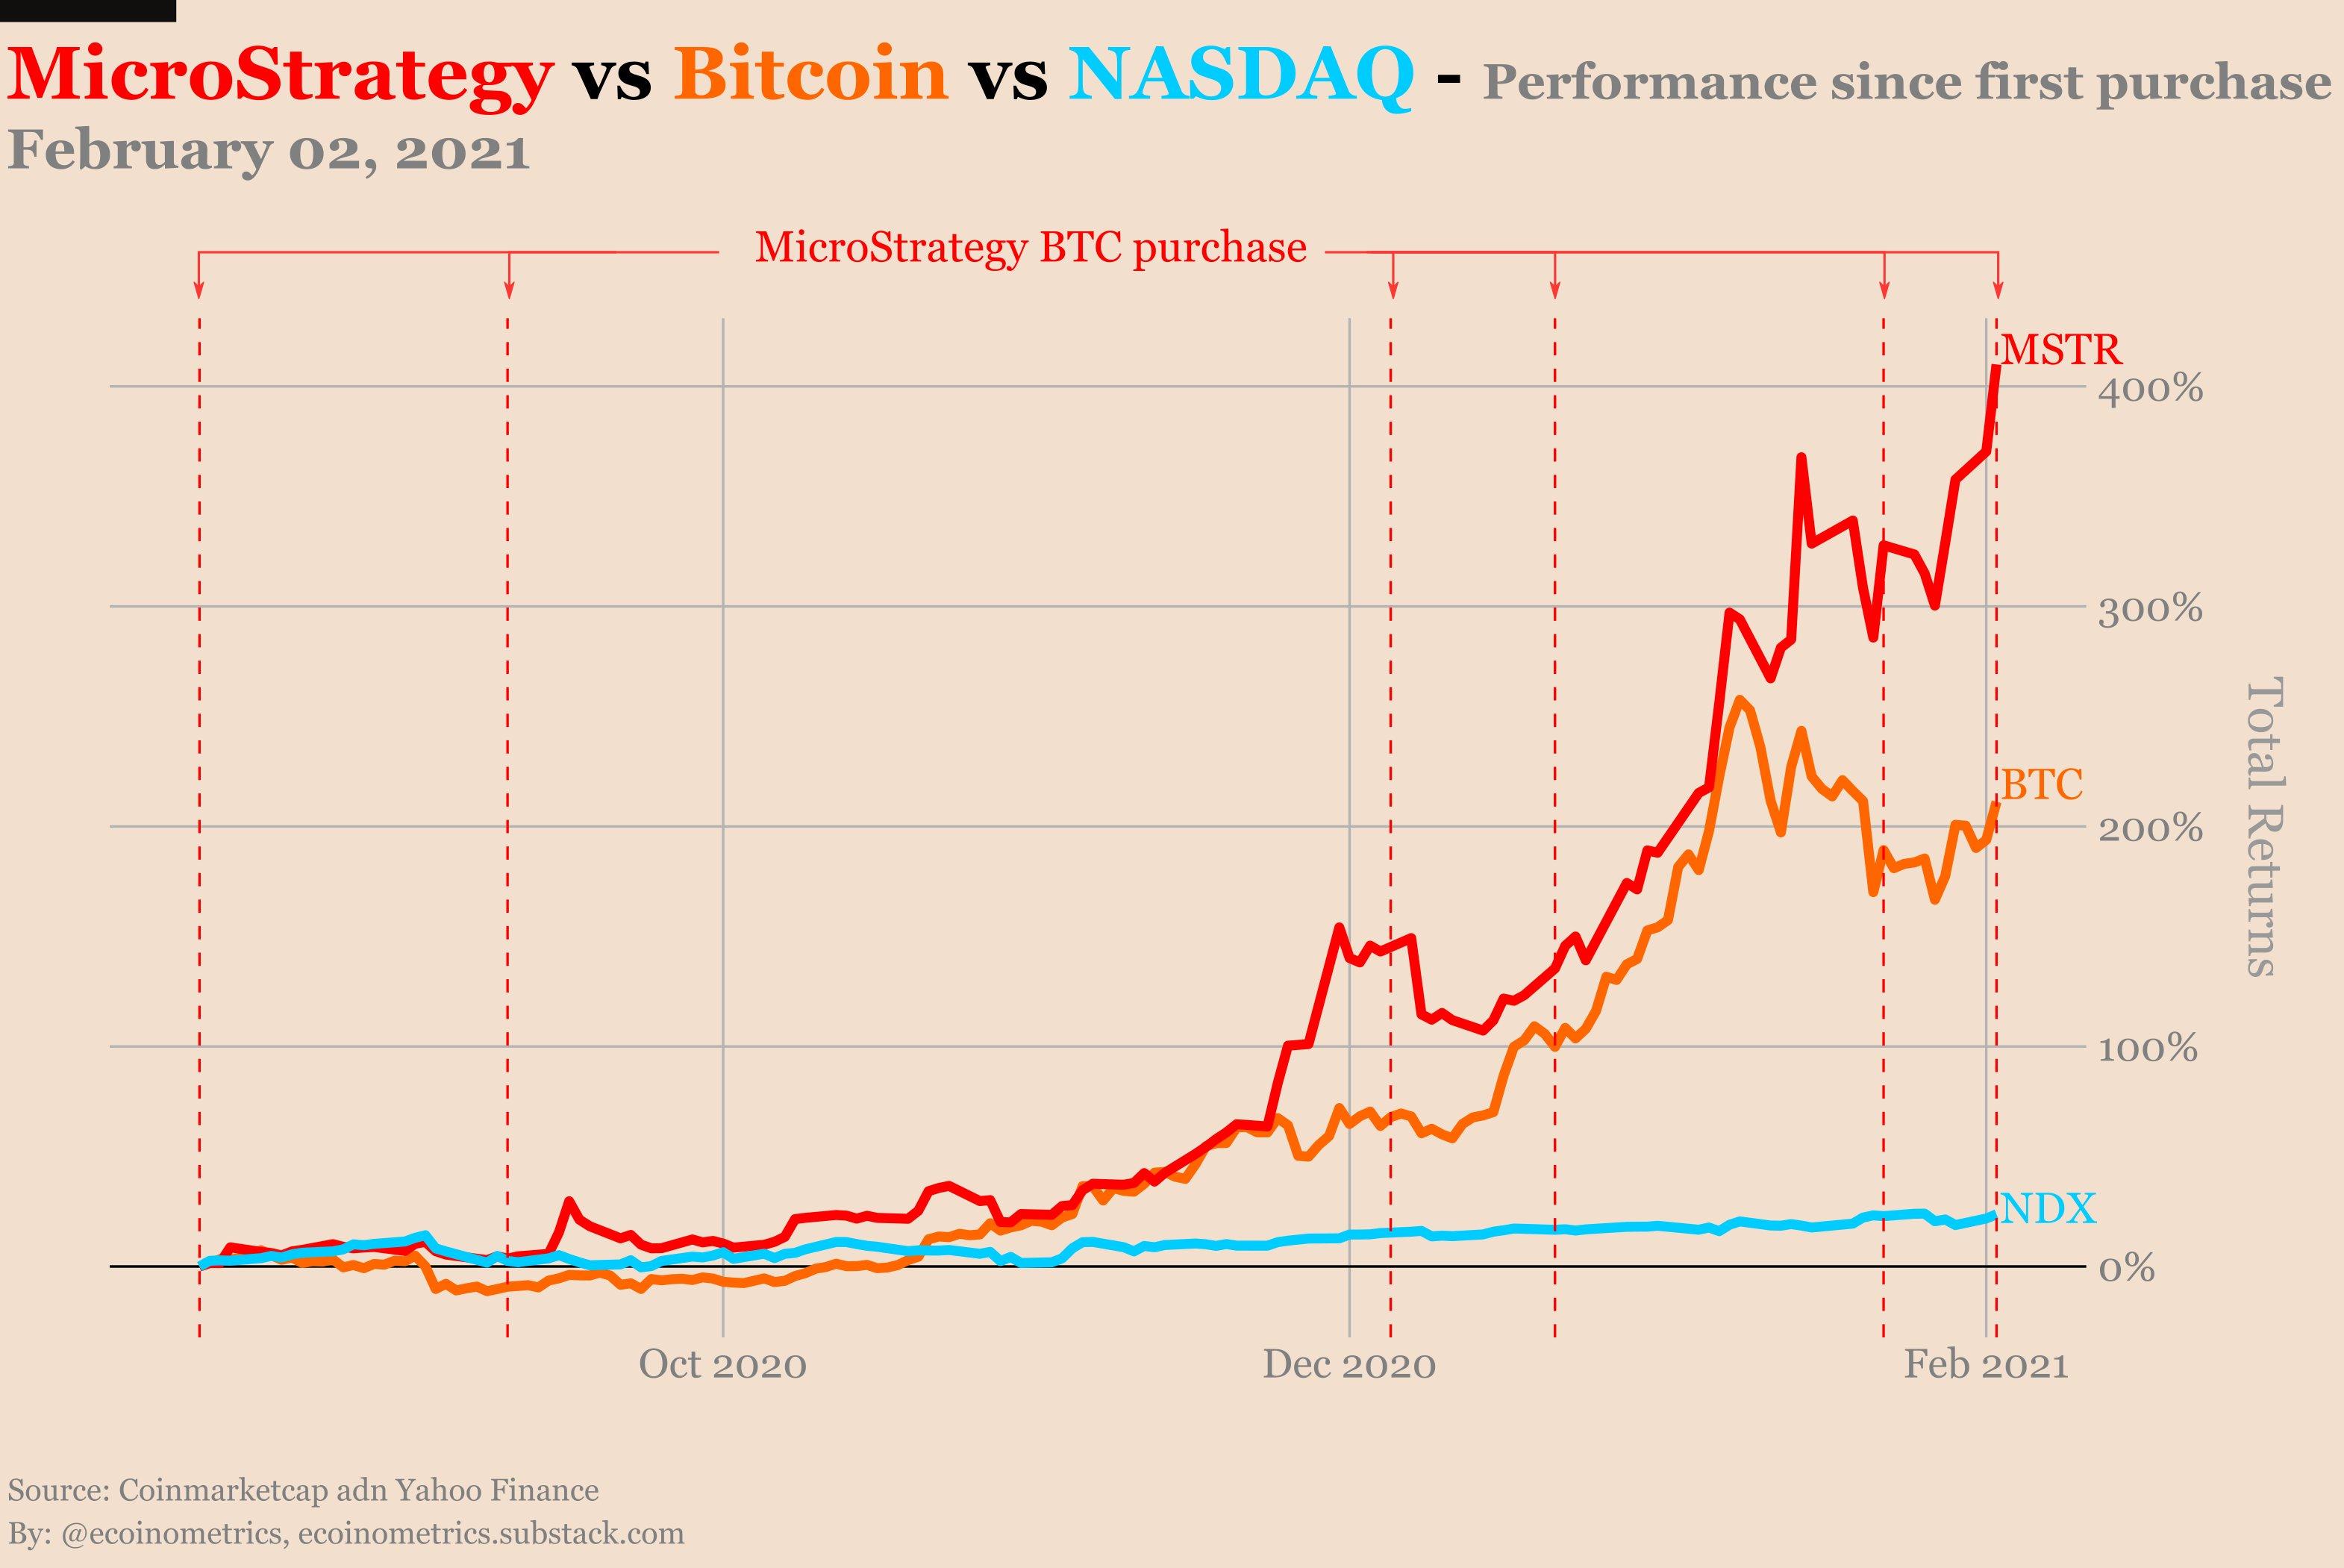 MSTR vs. BTC vs. NASDAQ